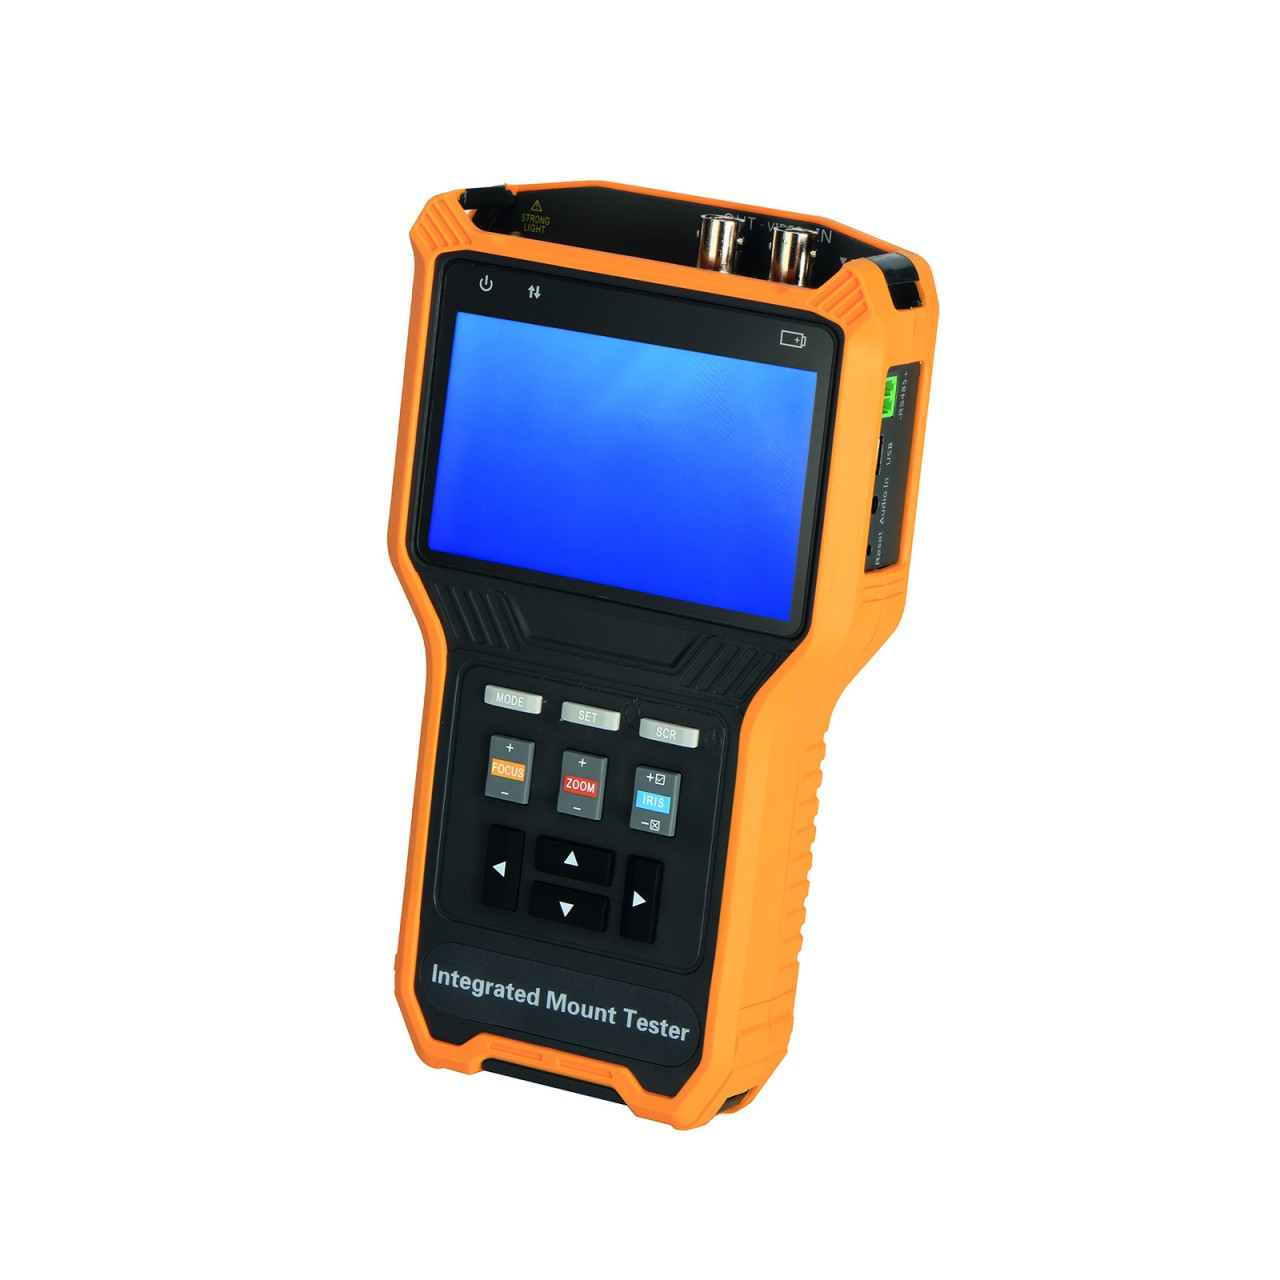 TURM Testgerät für HDCVI, AHD, TVI, CVBS Kameras bis 4 MP Auflösung